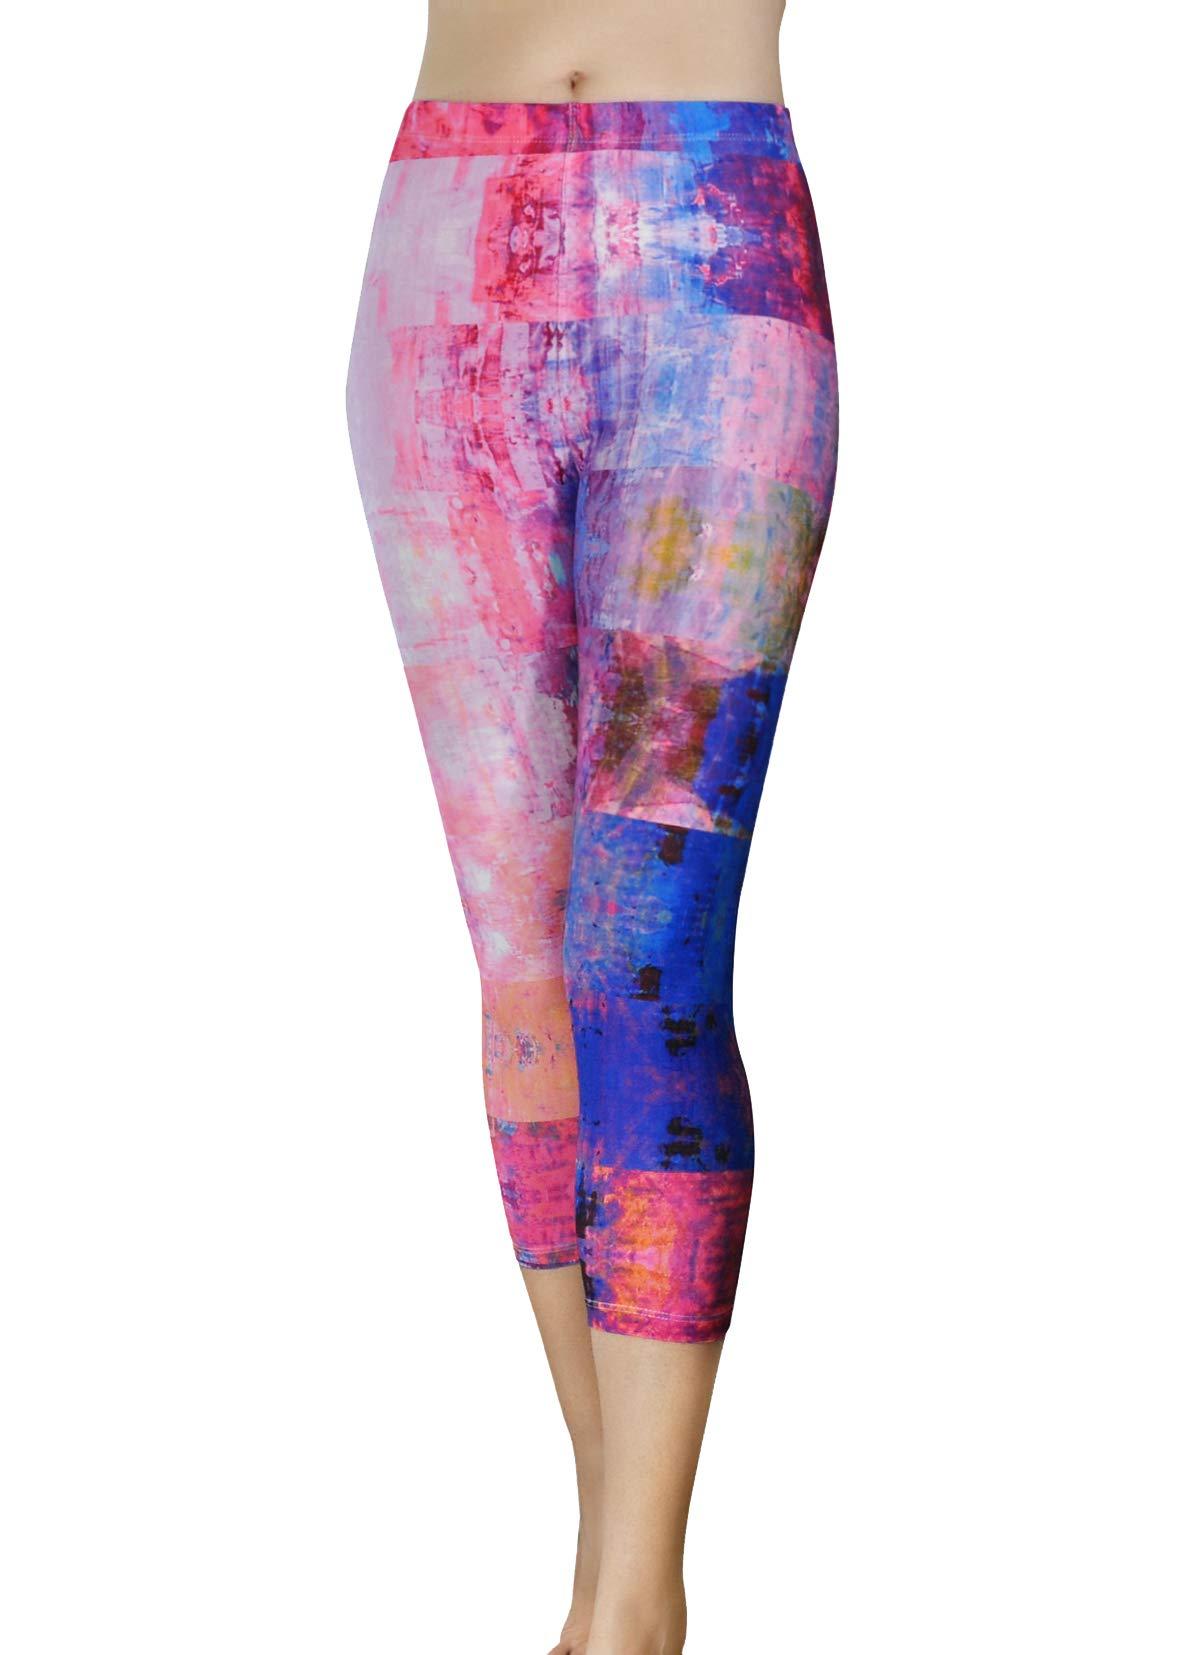 Comfy Yoga Pants - Workout Capris - High Waist Workout Leggings for Women - Lightweight Printed Yoga Legging (Capri Pink Opal)